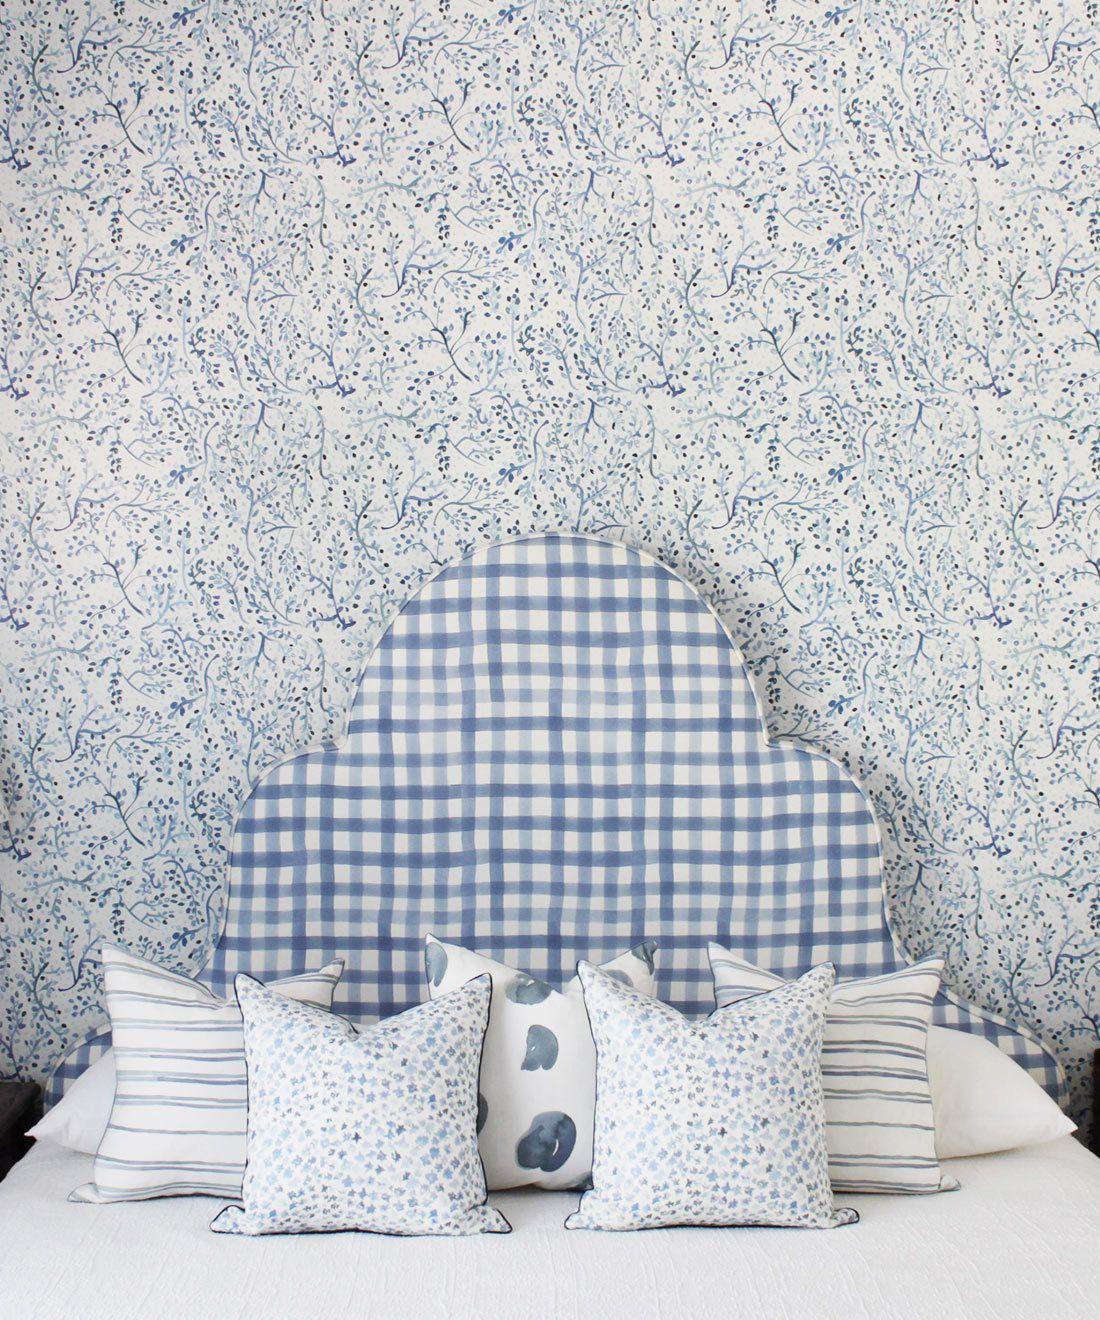 Indigo Garden • Blue Botanical Wallpaper • Floral • Bedroom with plaid blue headboard and white pillows. Milton & King Australia